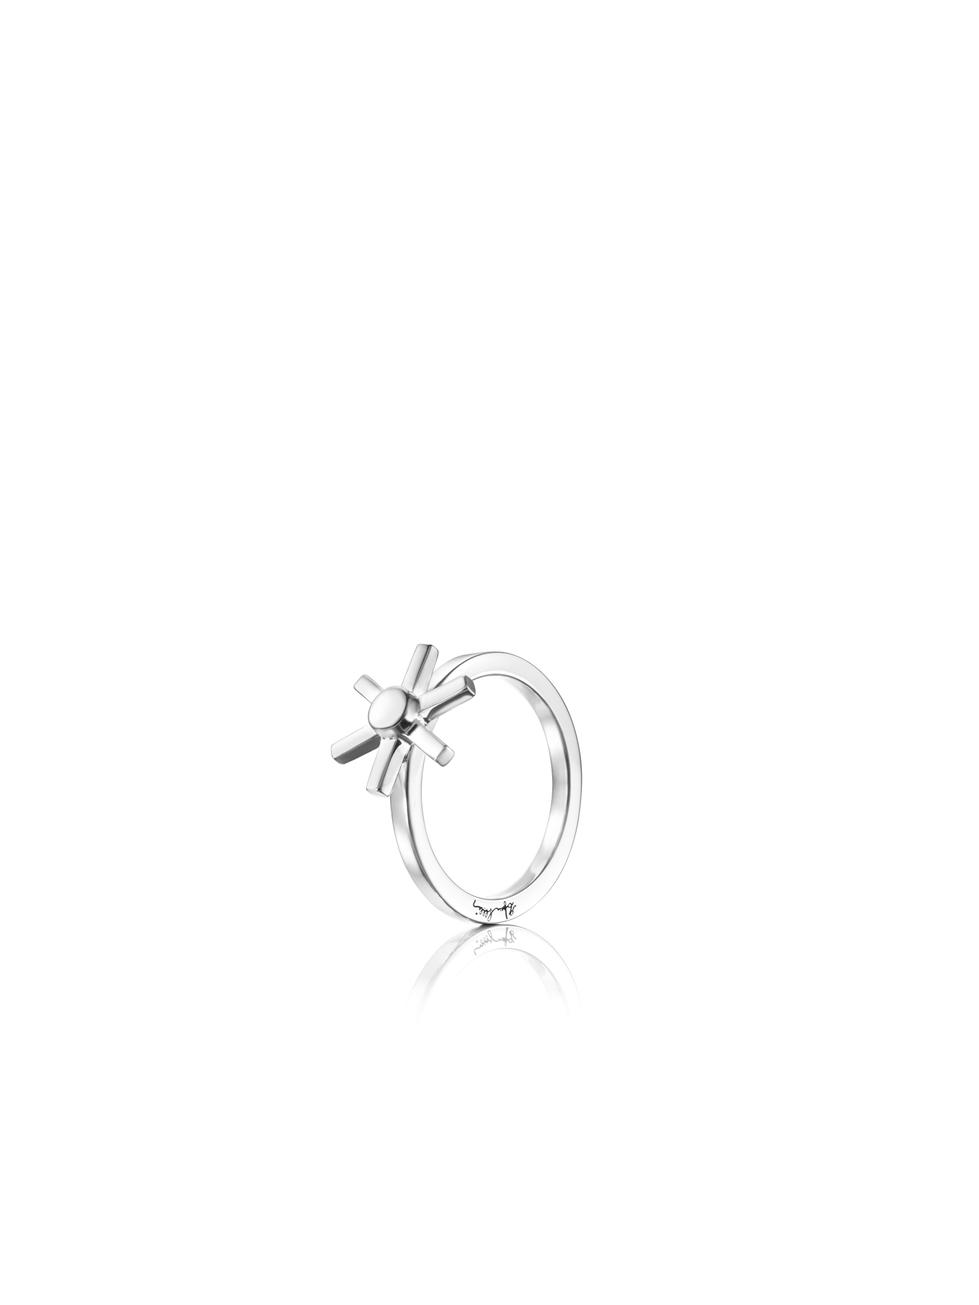 Starflower Ring 13-100-01220(1)